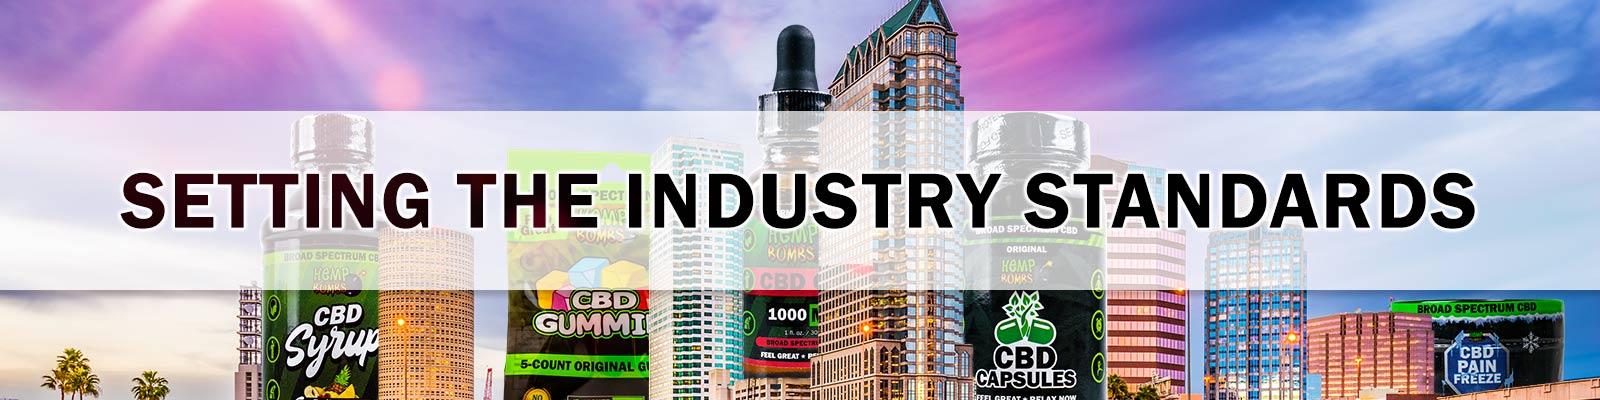 Hemp Bombs setting industry standards